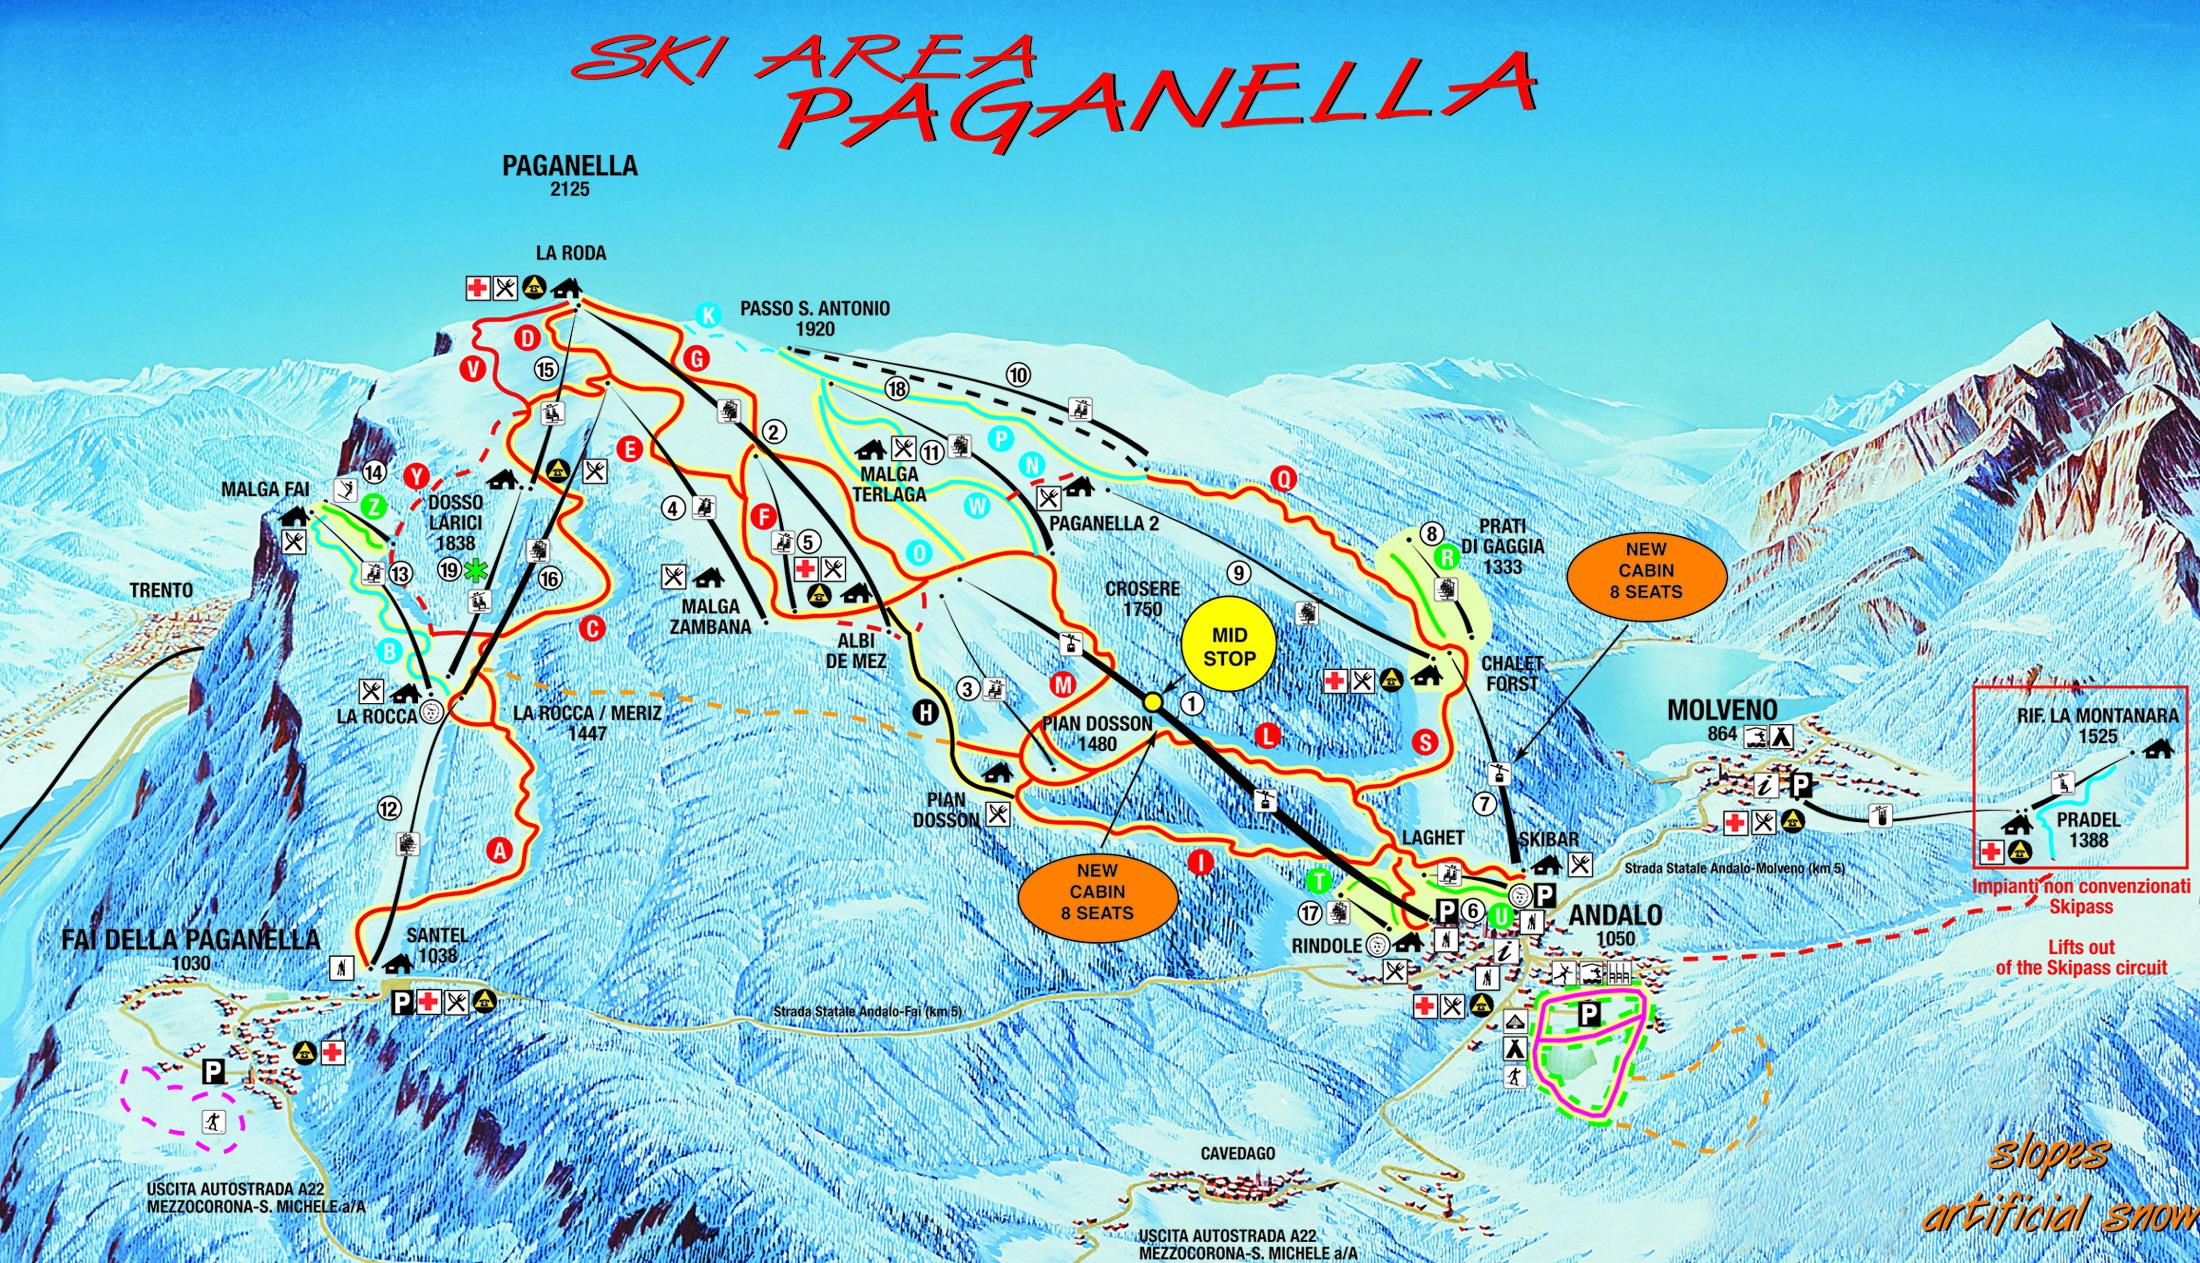 Paganella-Andalo